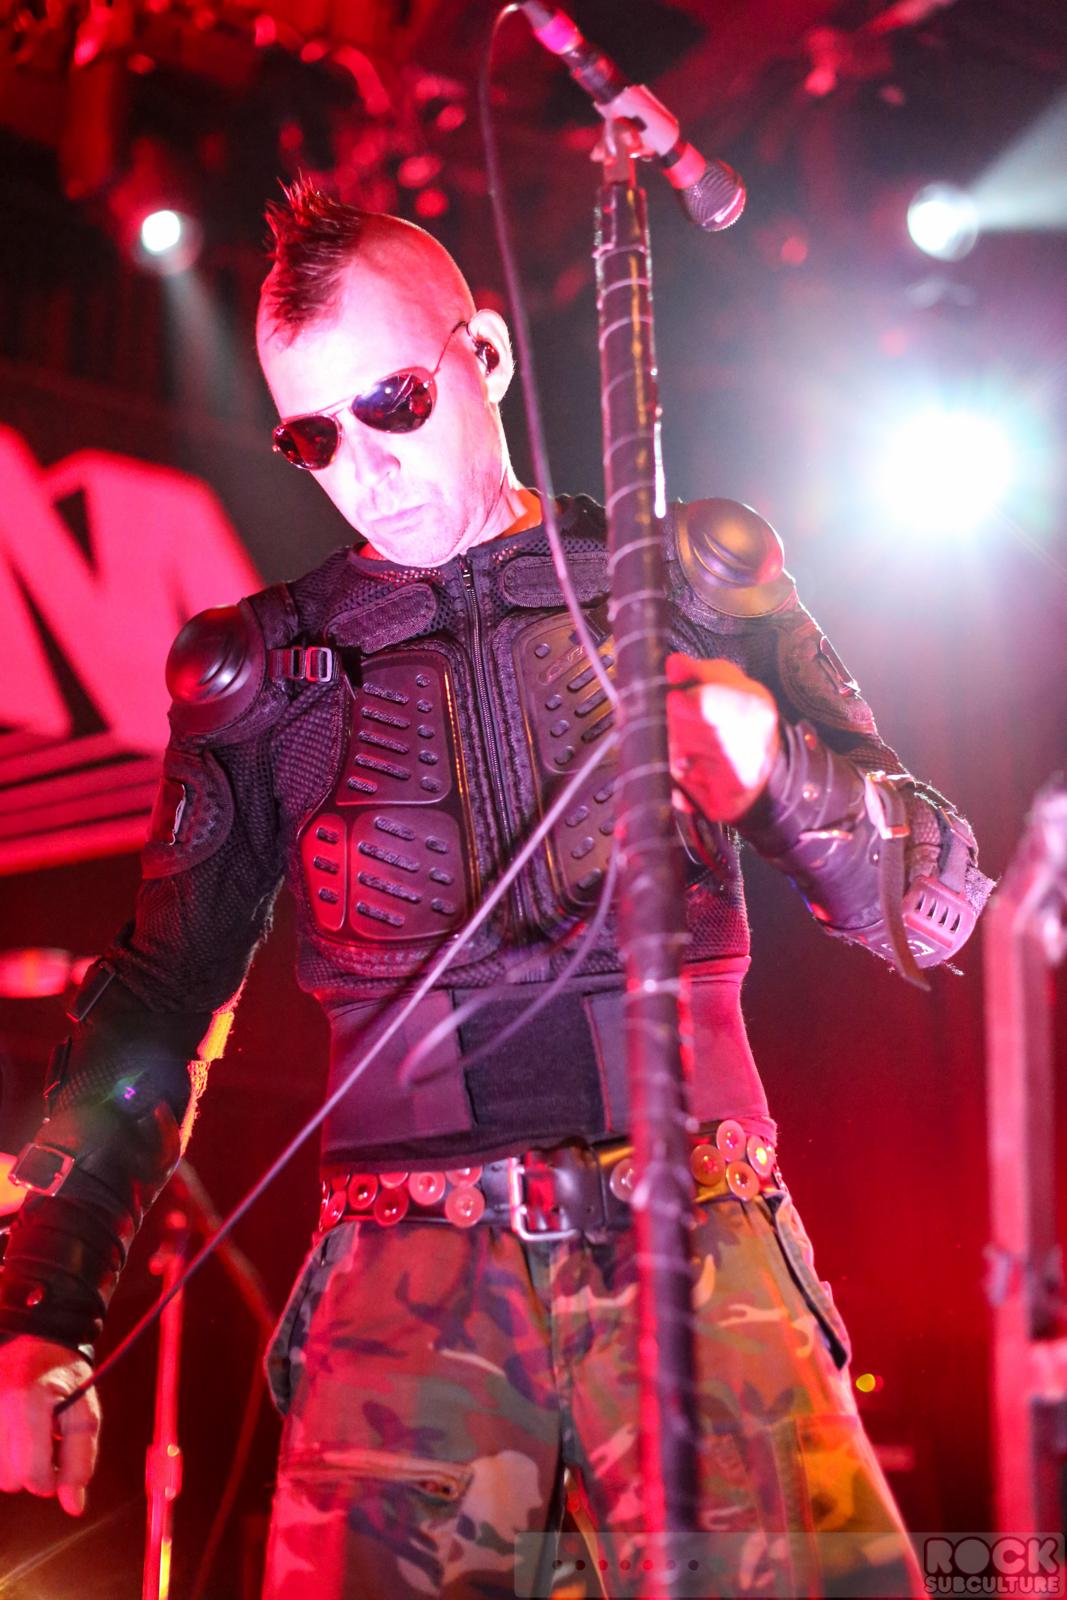 KMFDM - Tohuvabohu | Releases, Reviews, Credits | Discogs